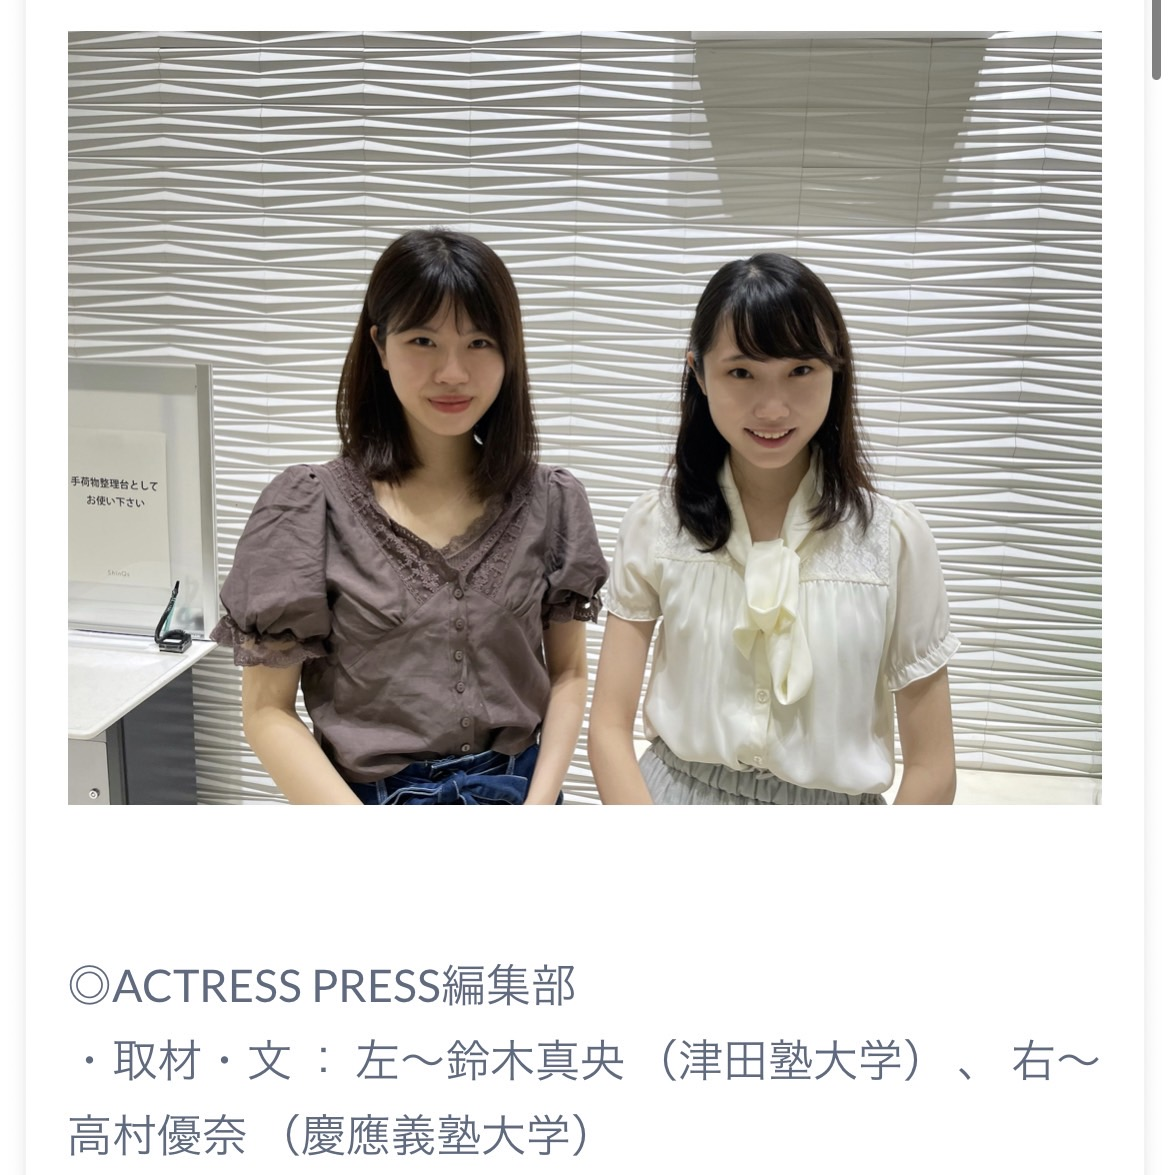 高村優奈 ACTRESS PRESS